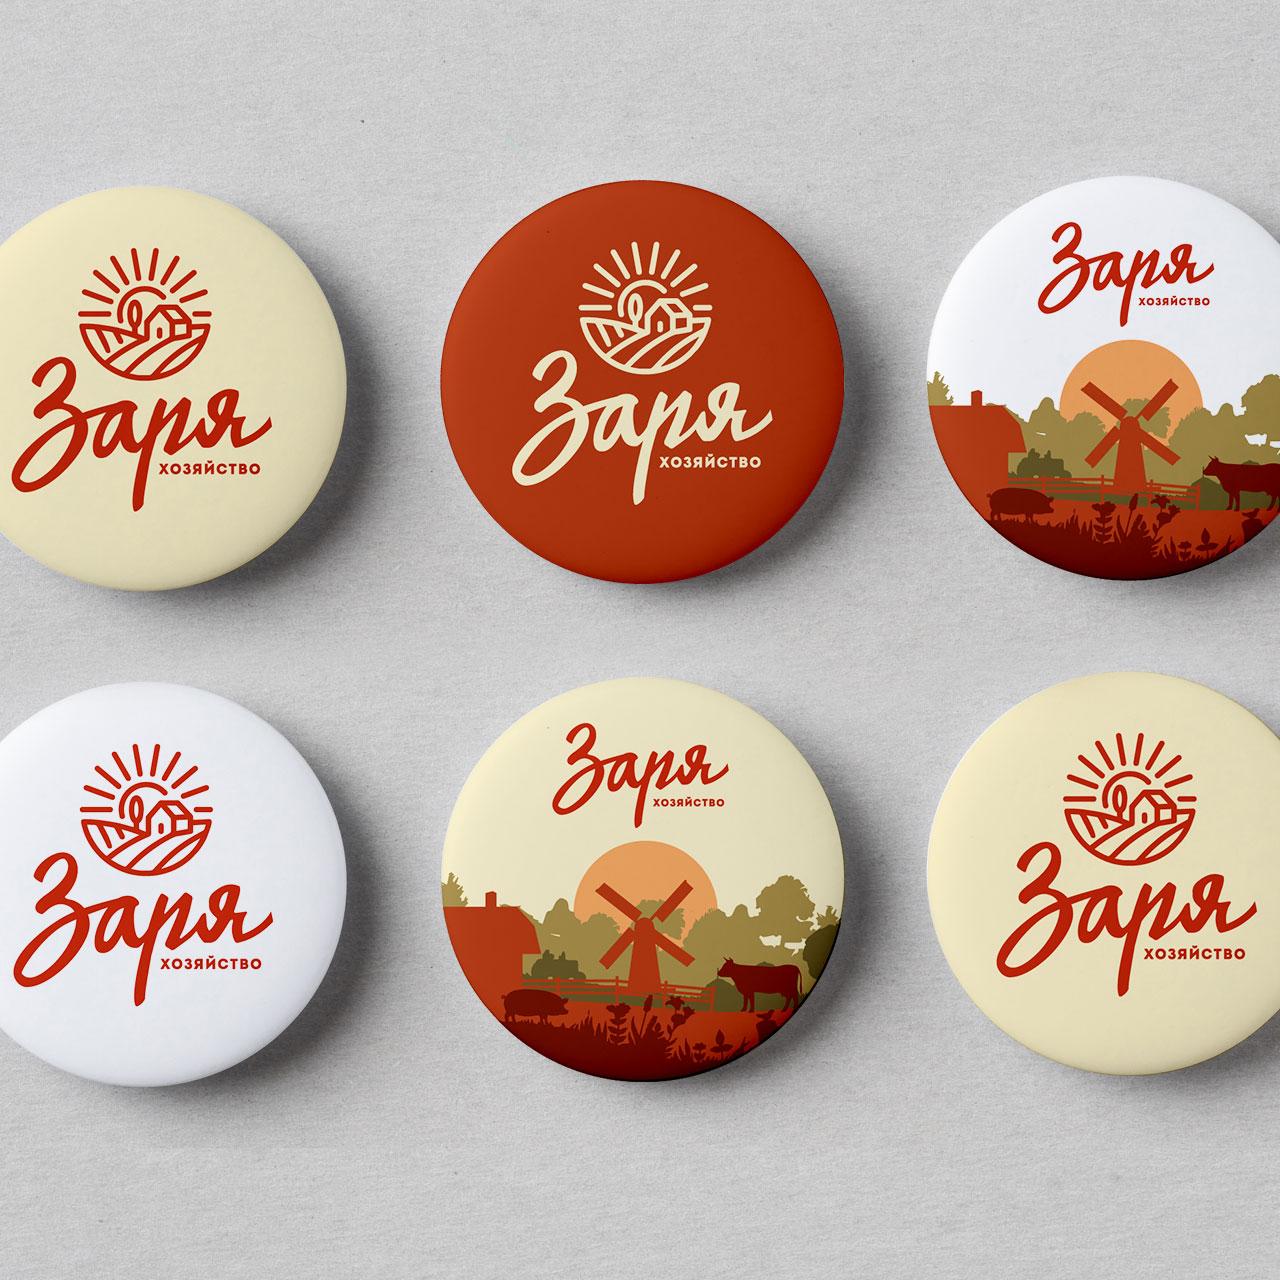 Визуальная среда бренда Заря на сувенирных значках